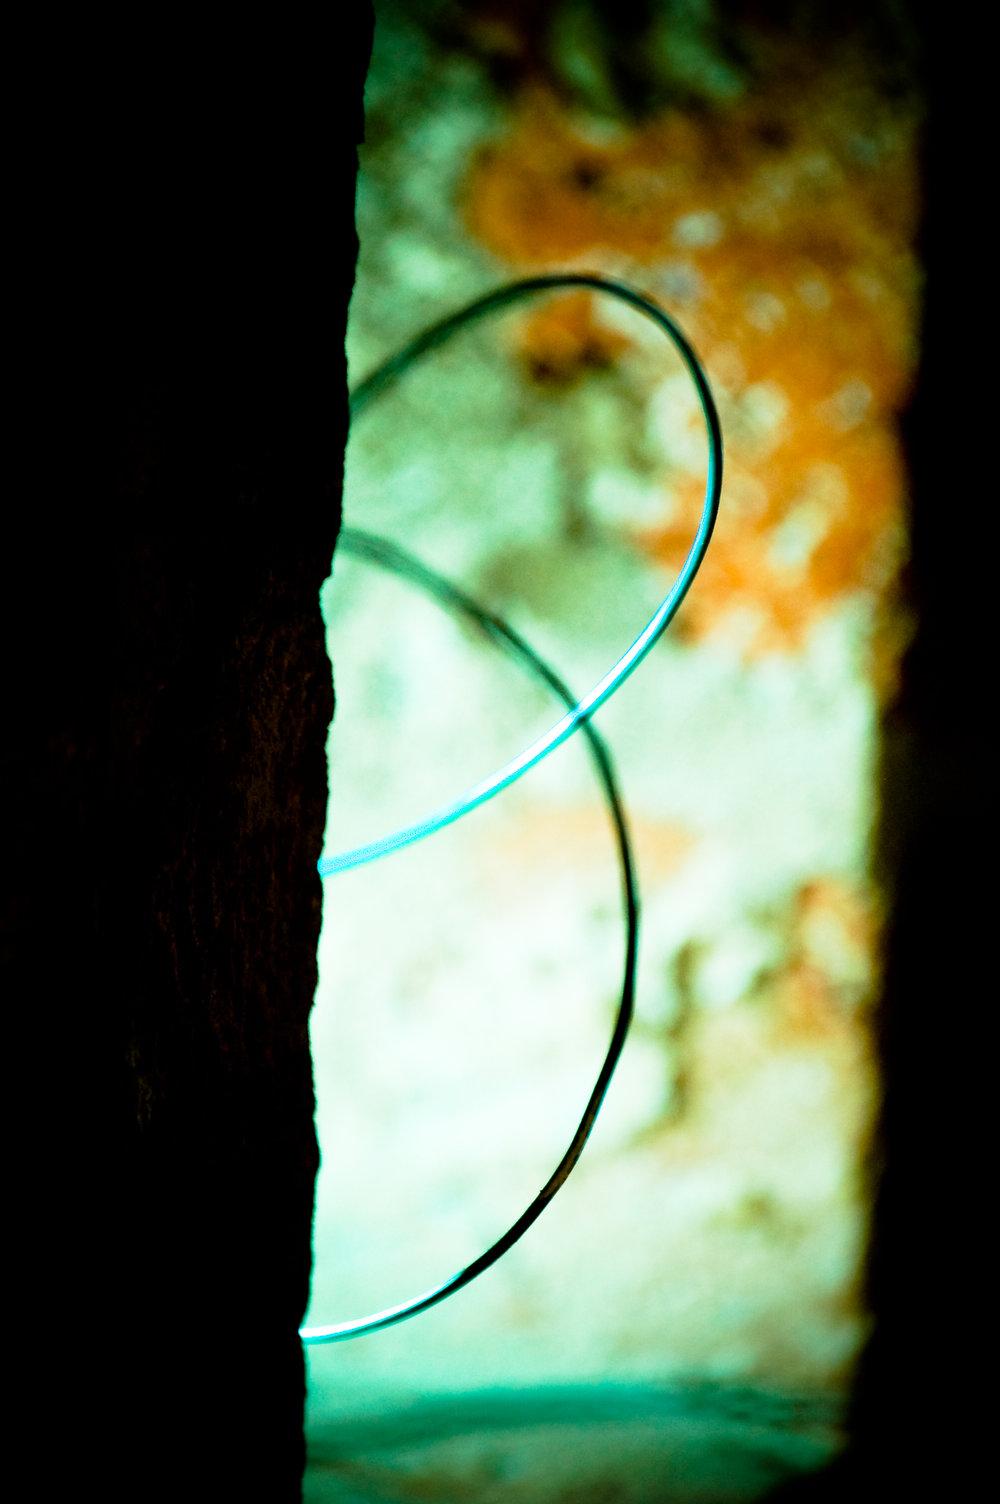 wires_random1.jpg